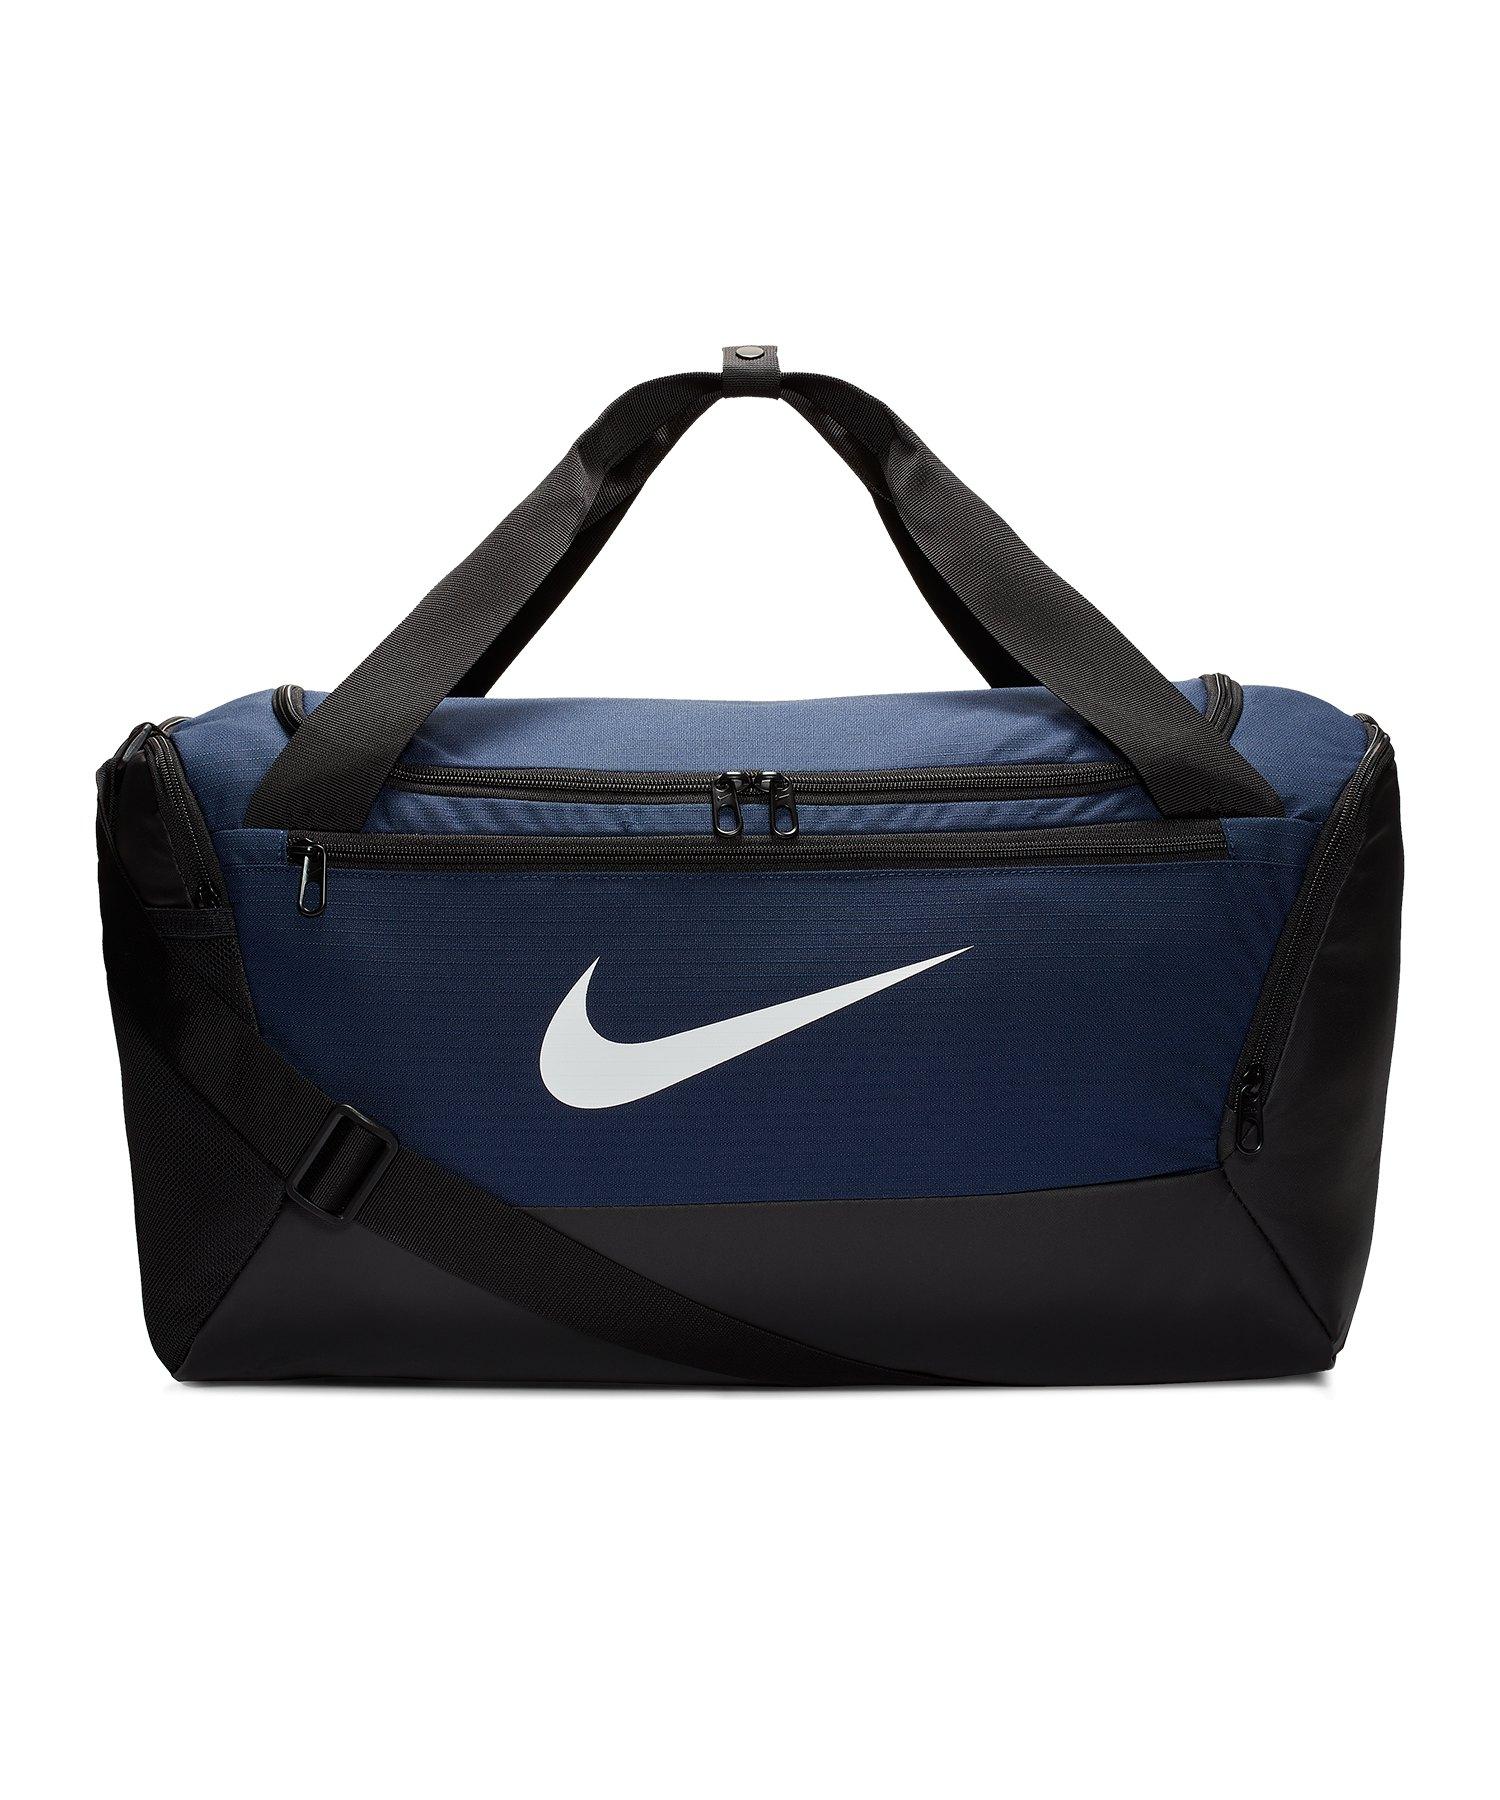 Nike Brasilia Duffel Bag Tasche Small Blau F410 - blau